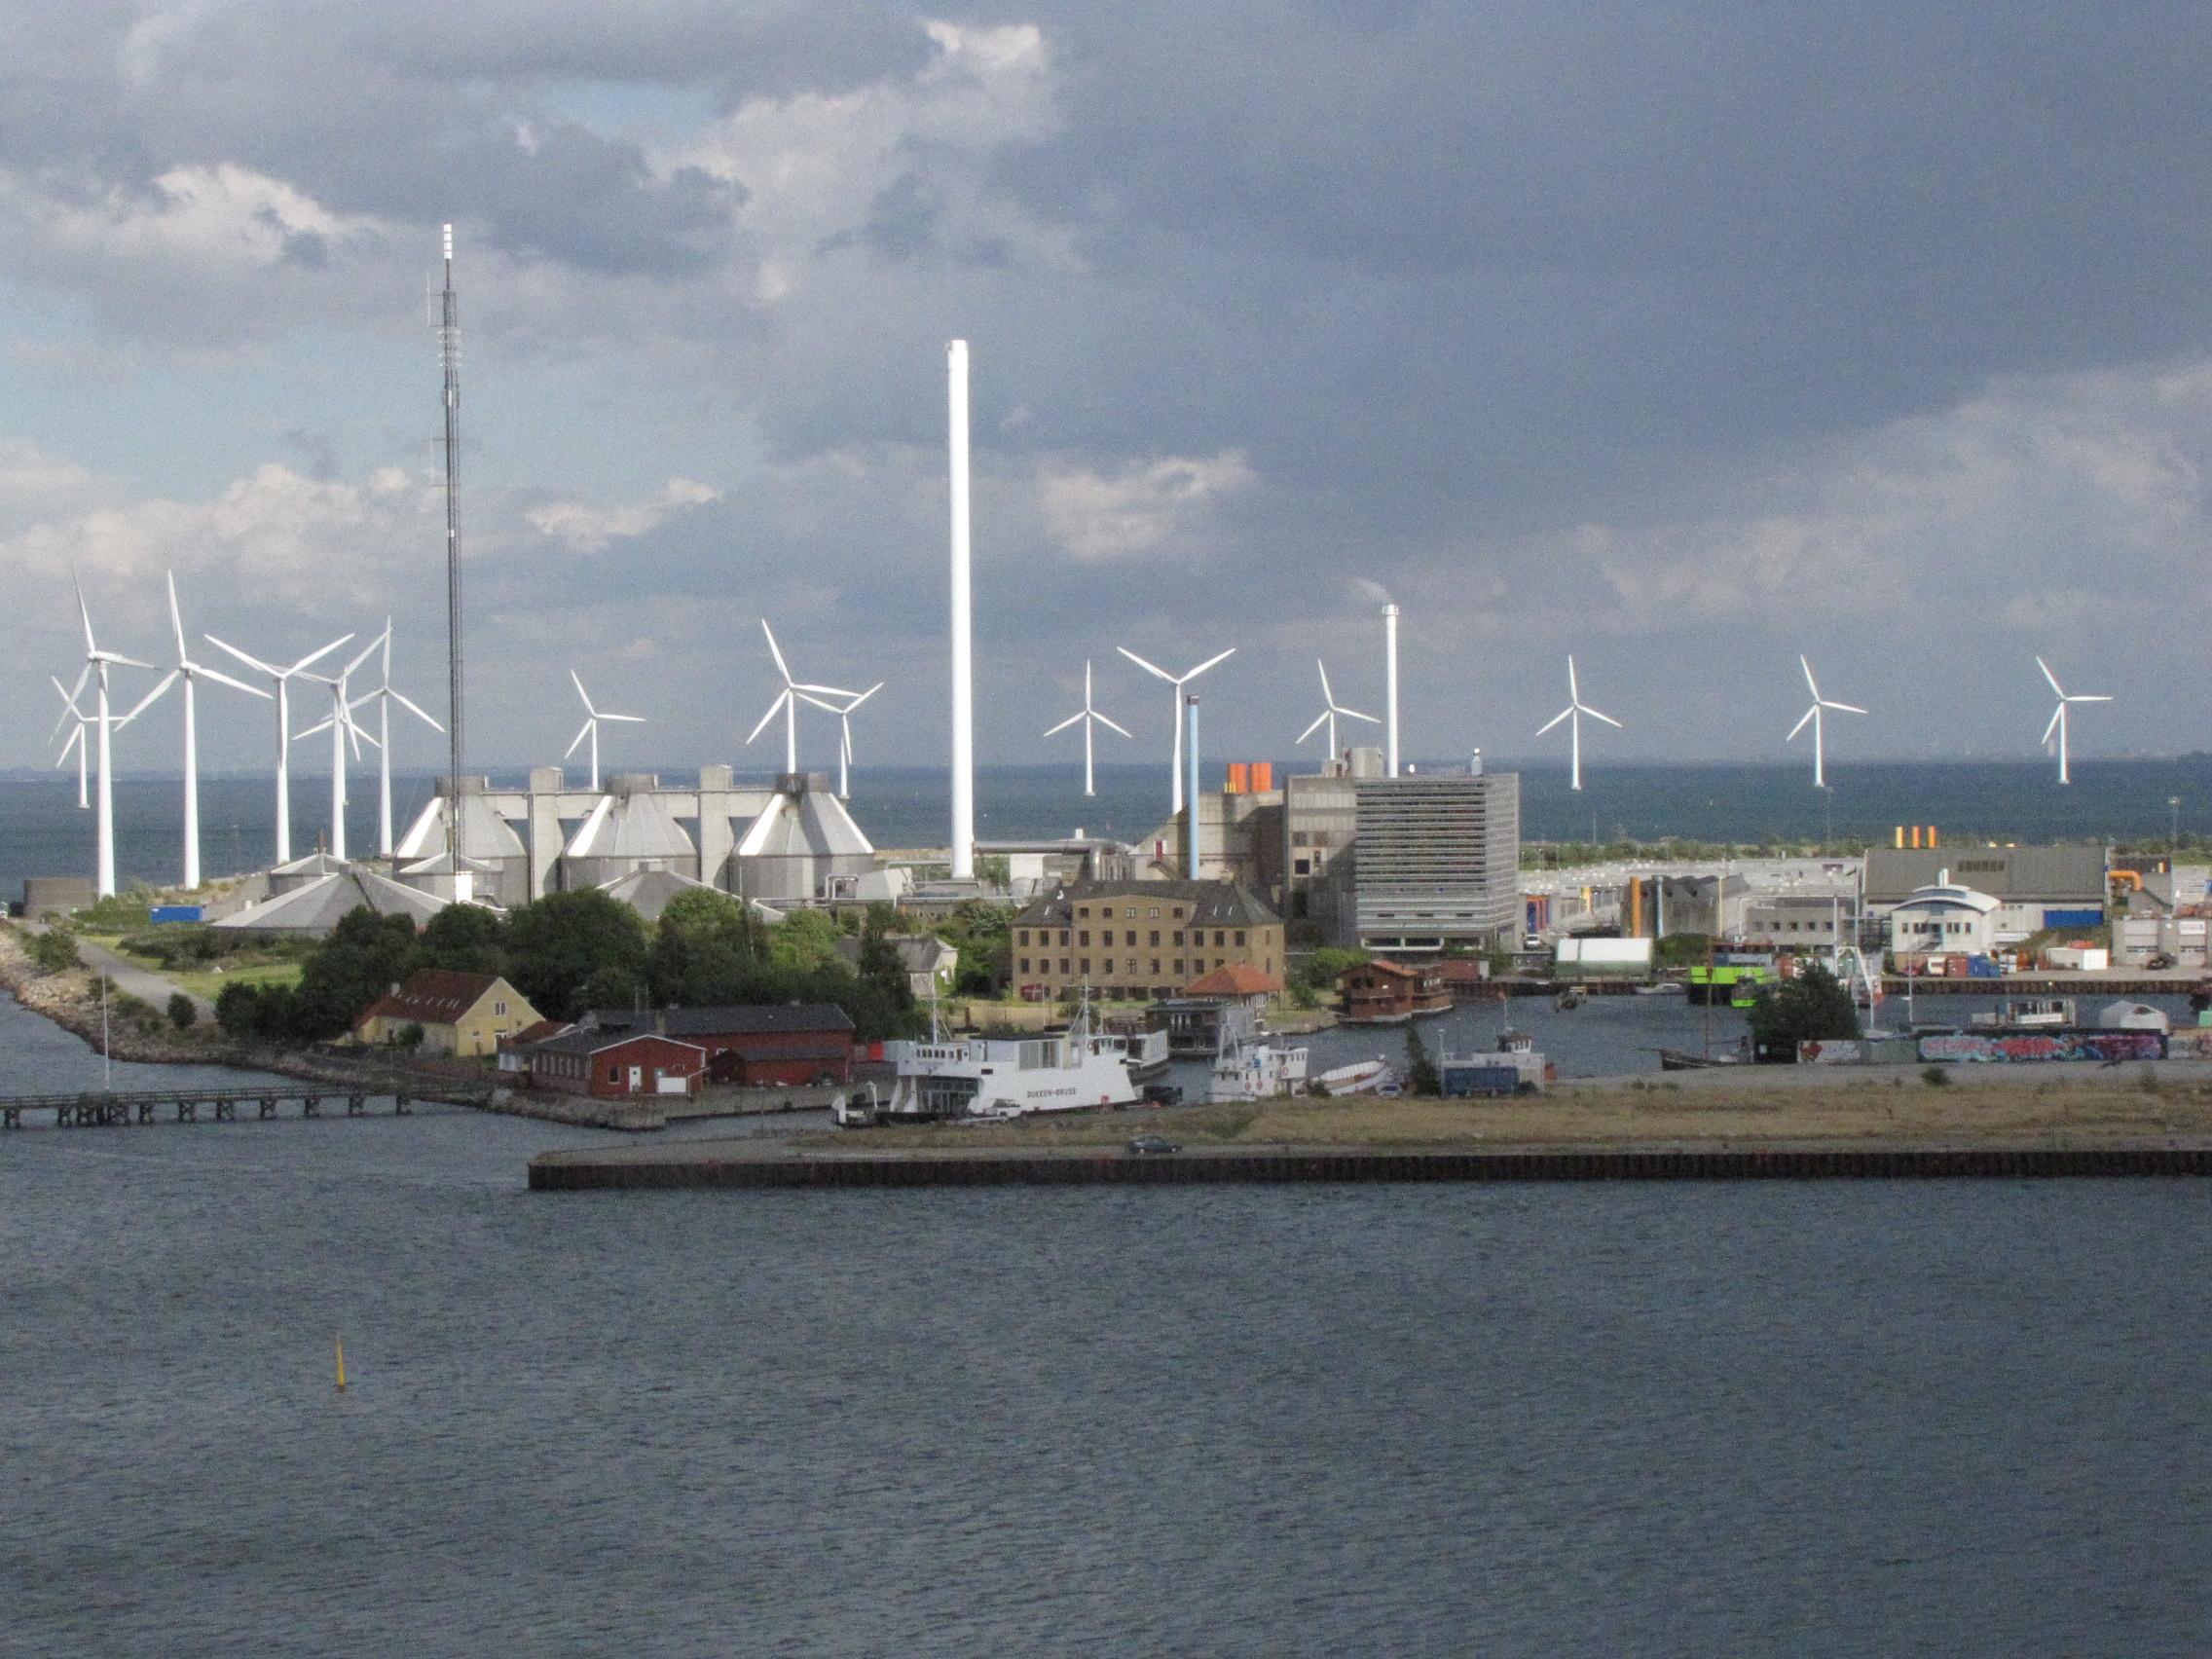 2012-08-29-windincopenhagehharbor.jpg